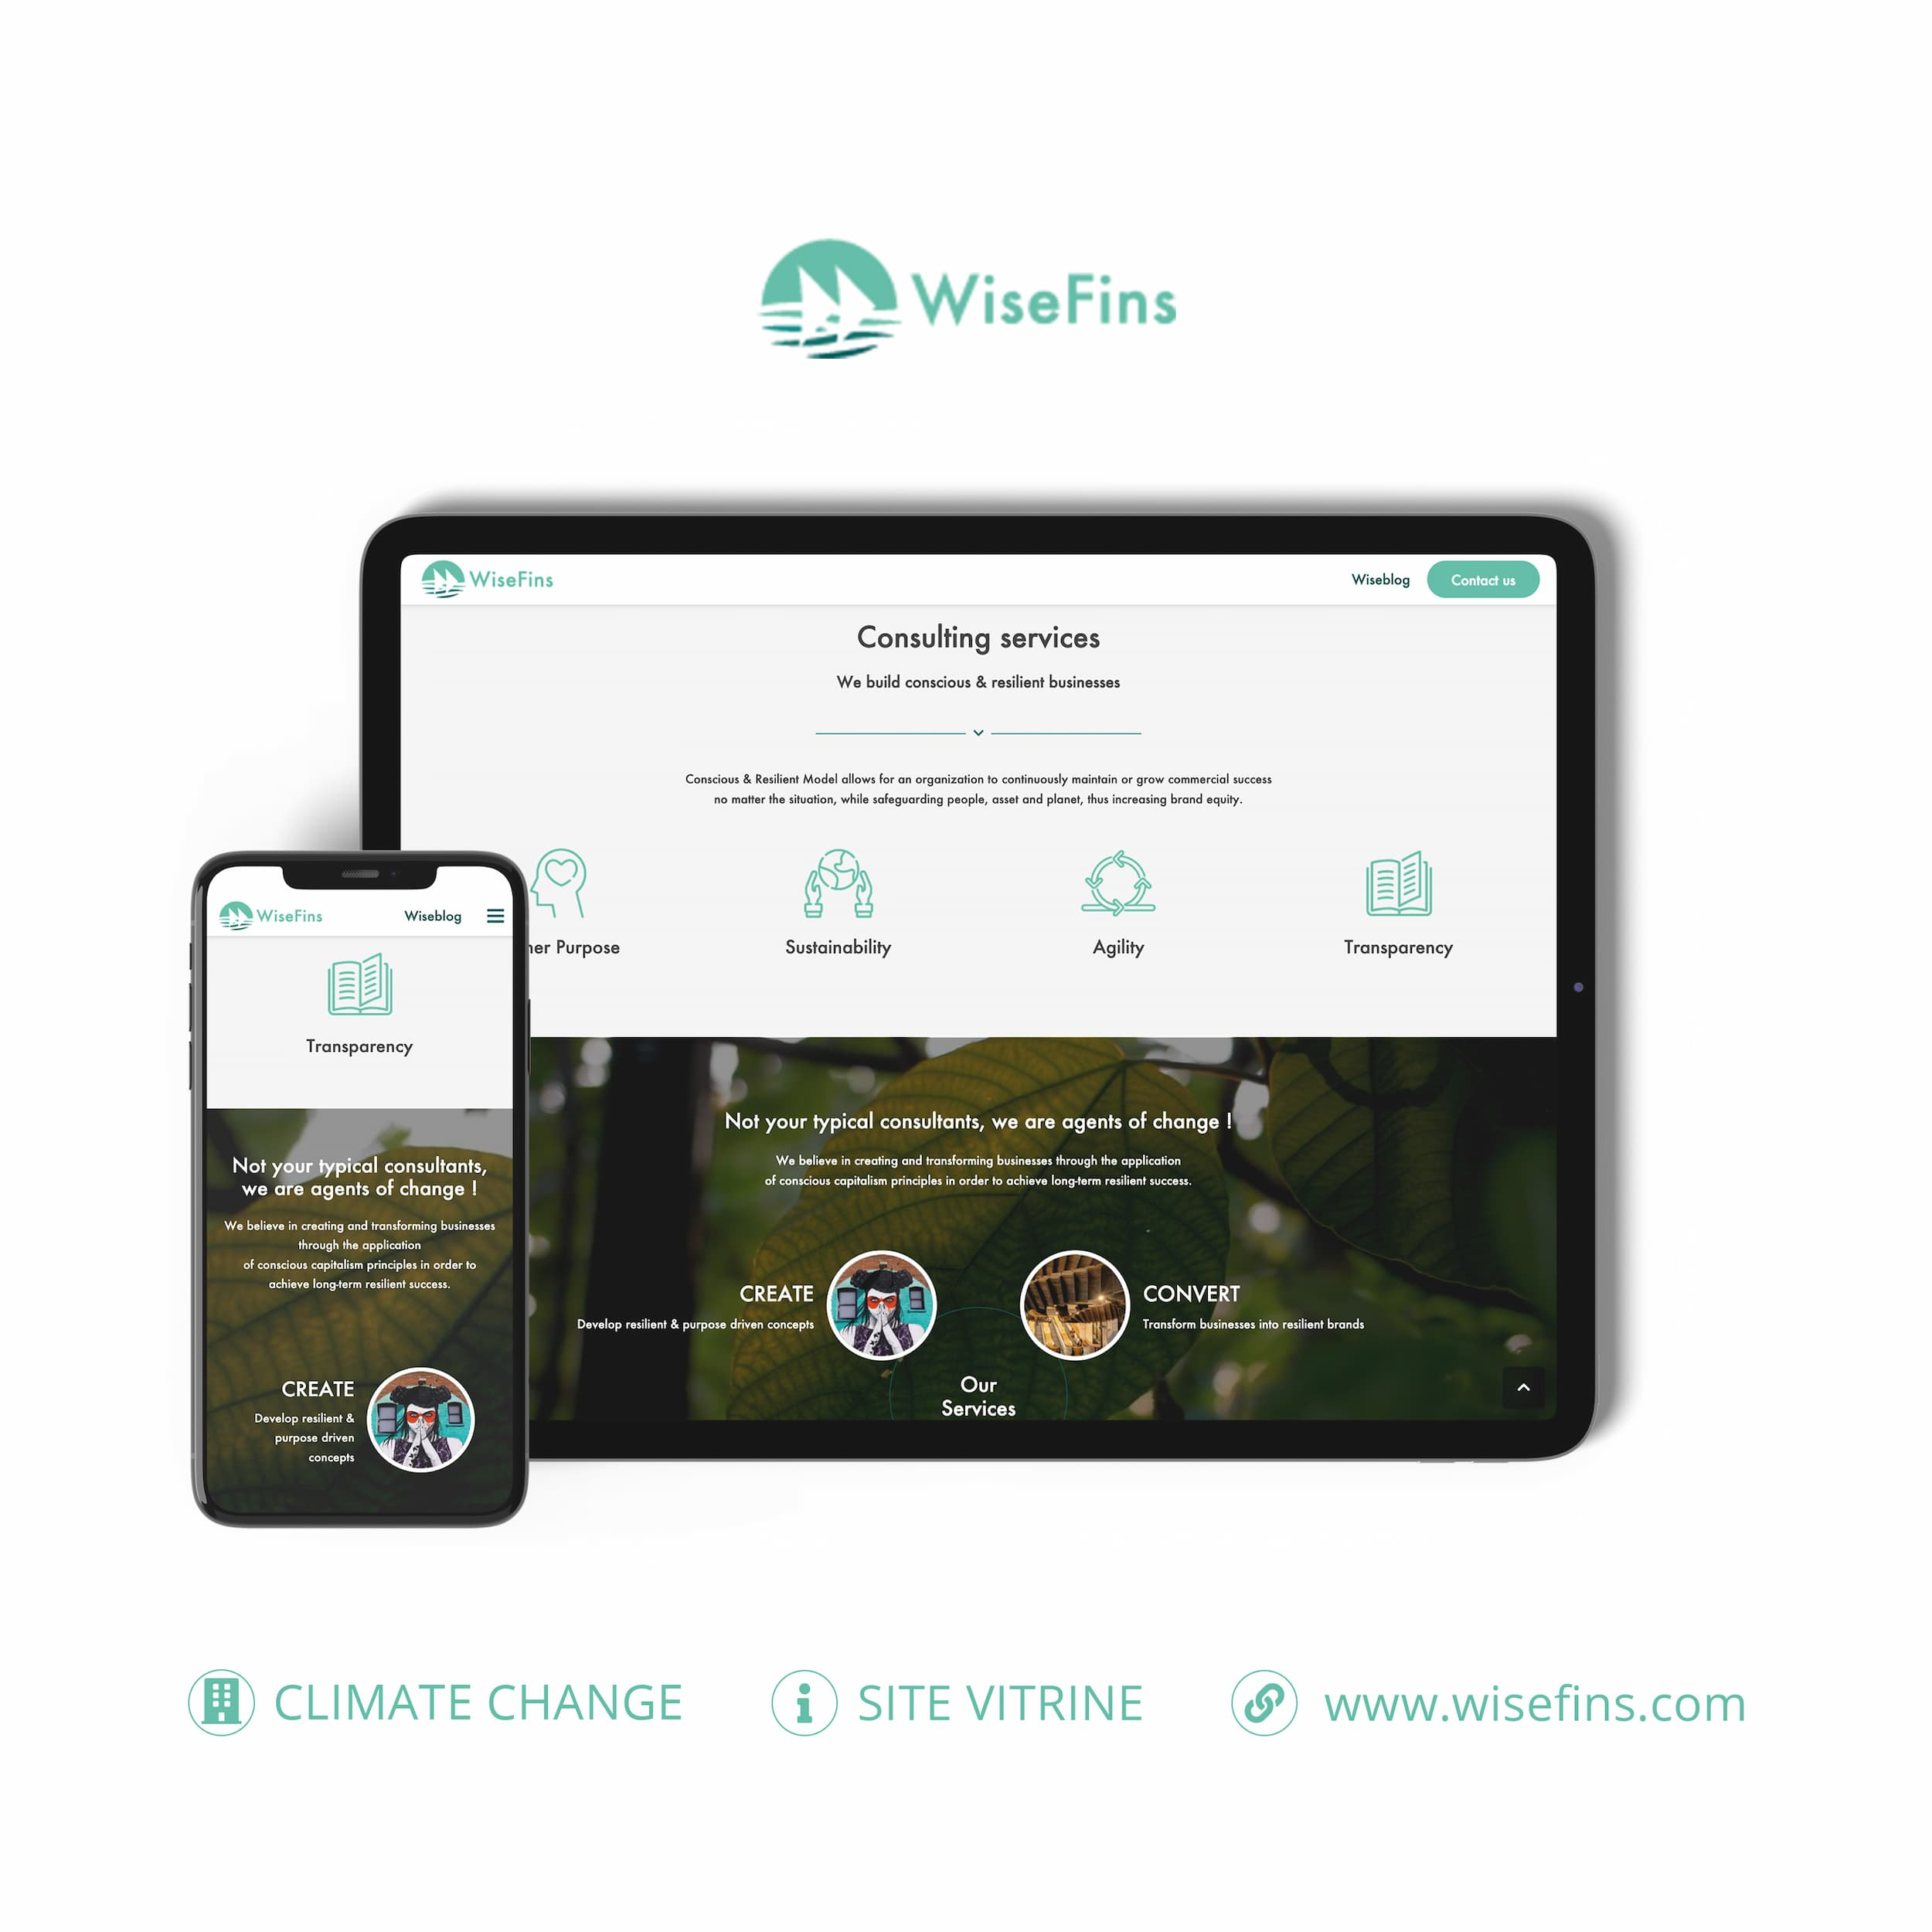 Wisefins site internet monsitelocal.fr